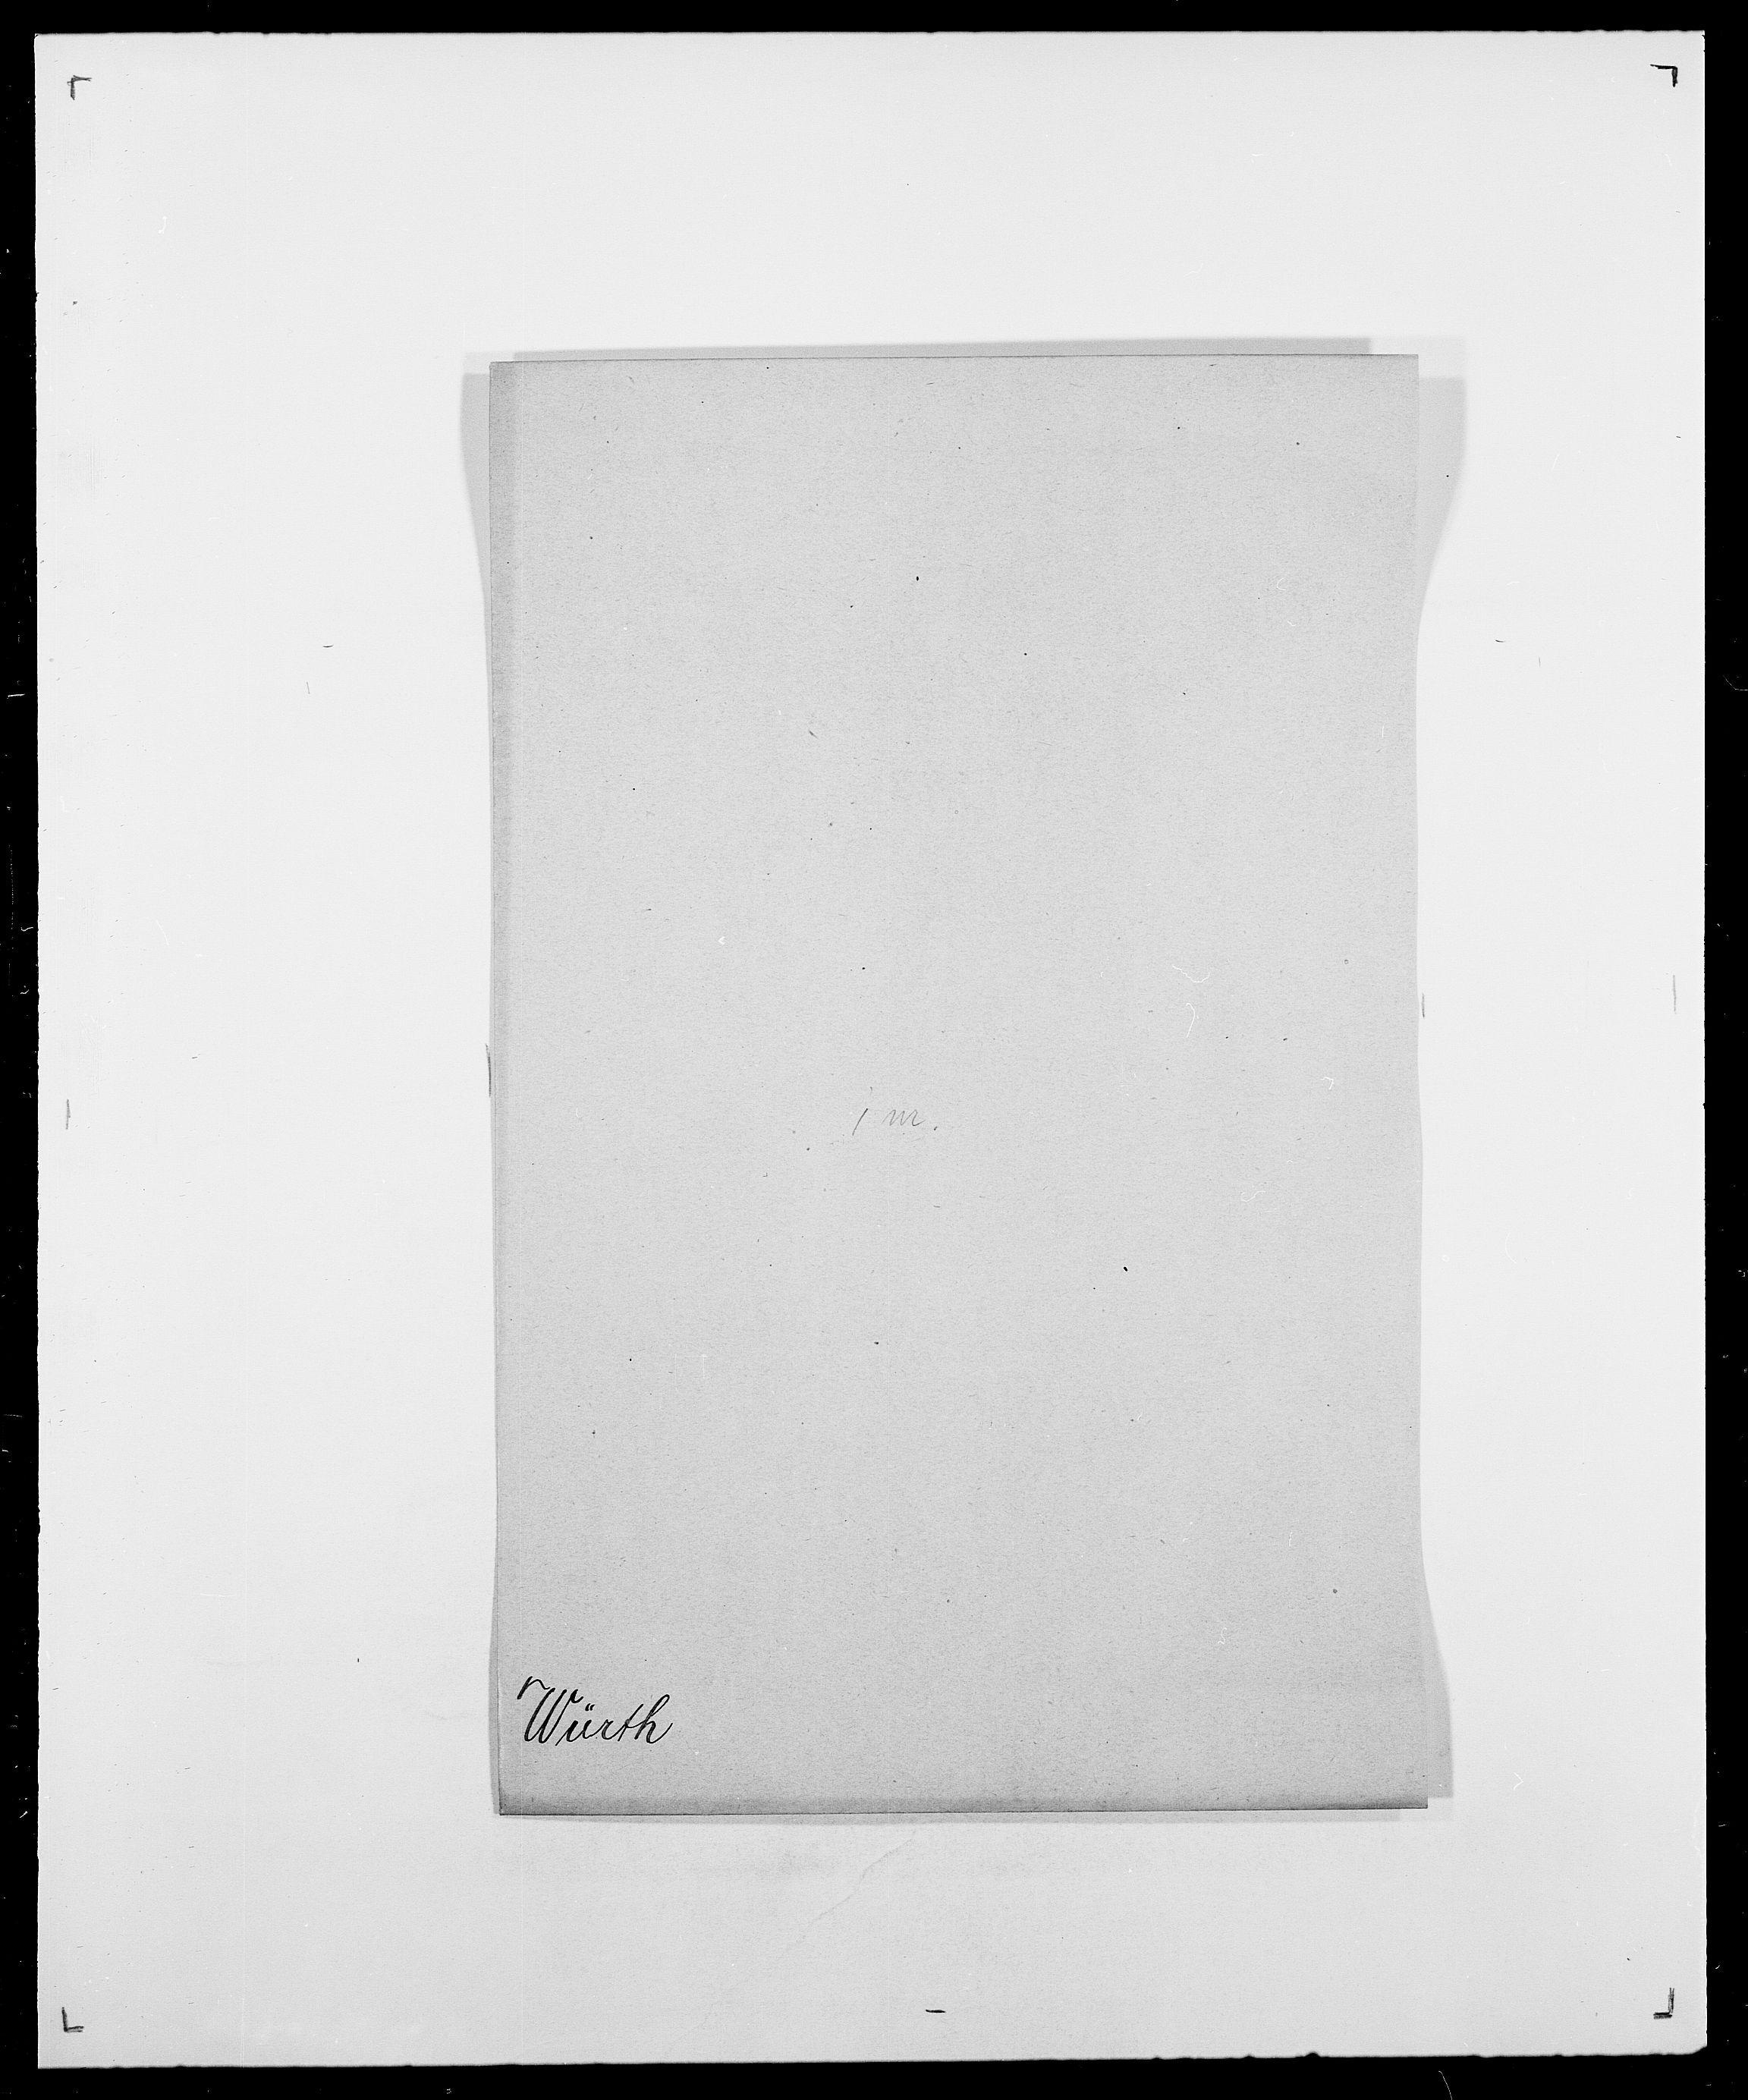 SAO, Delgobe, Charles Antoine - samling, D/Da/L0043: Wulfsberg - v. Zanten, s. 23